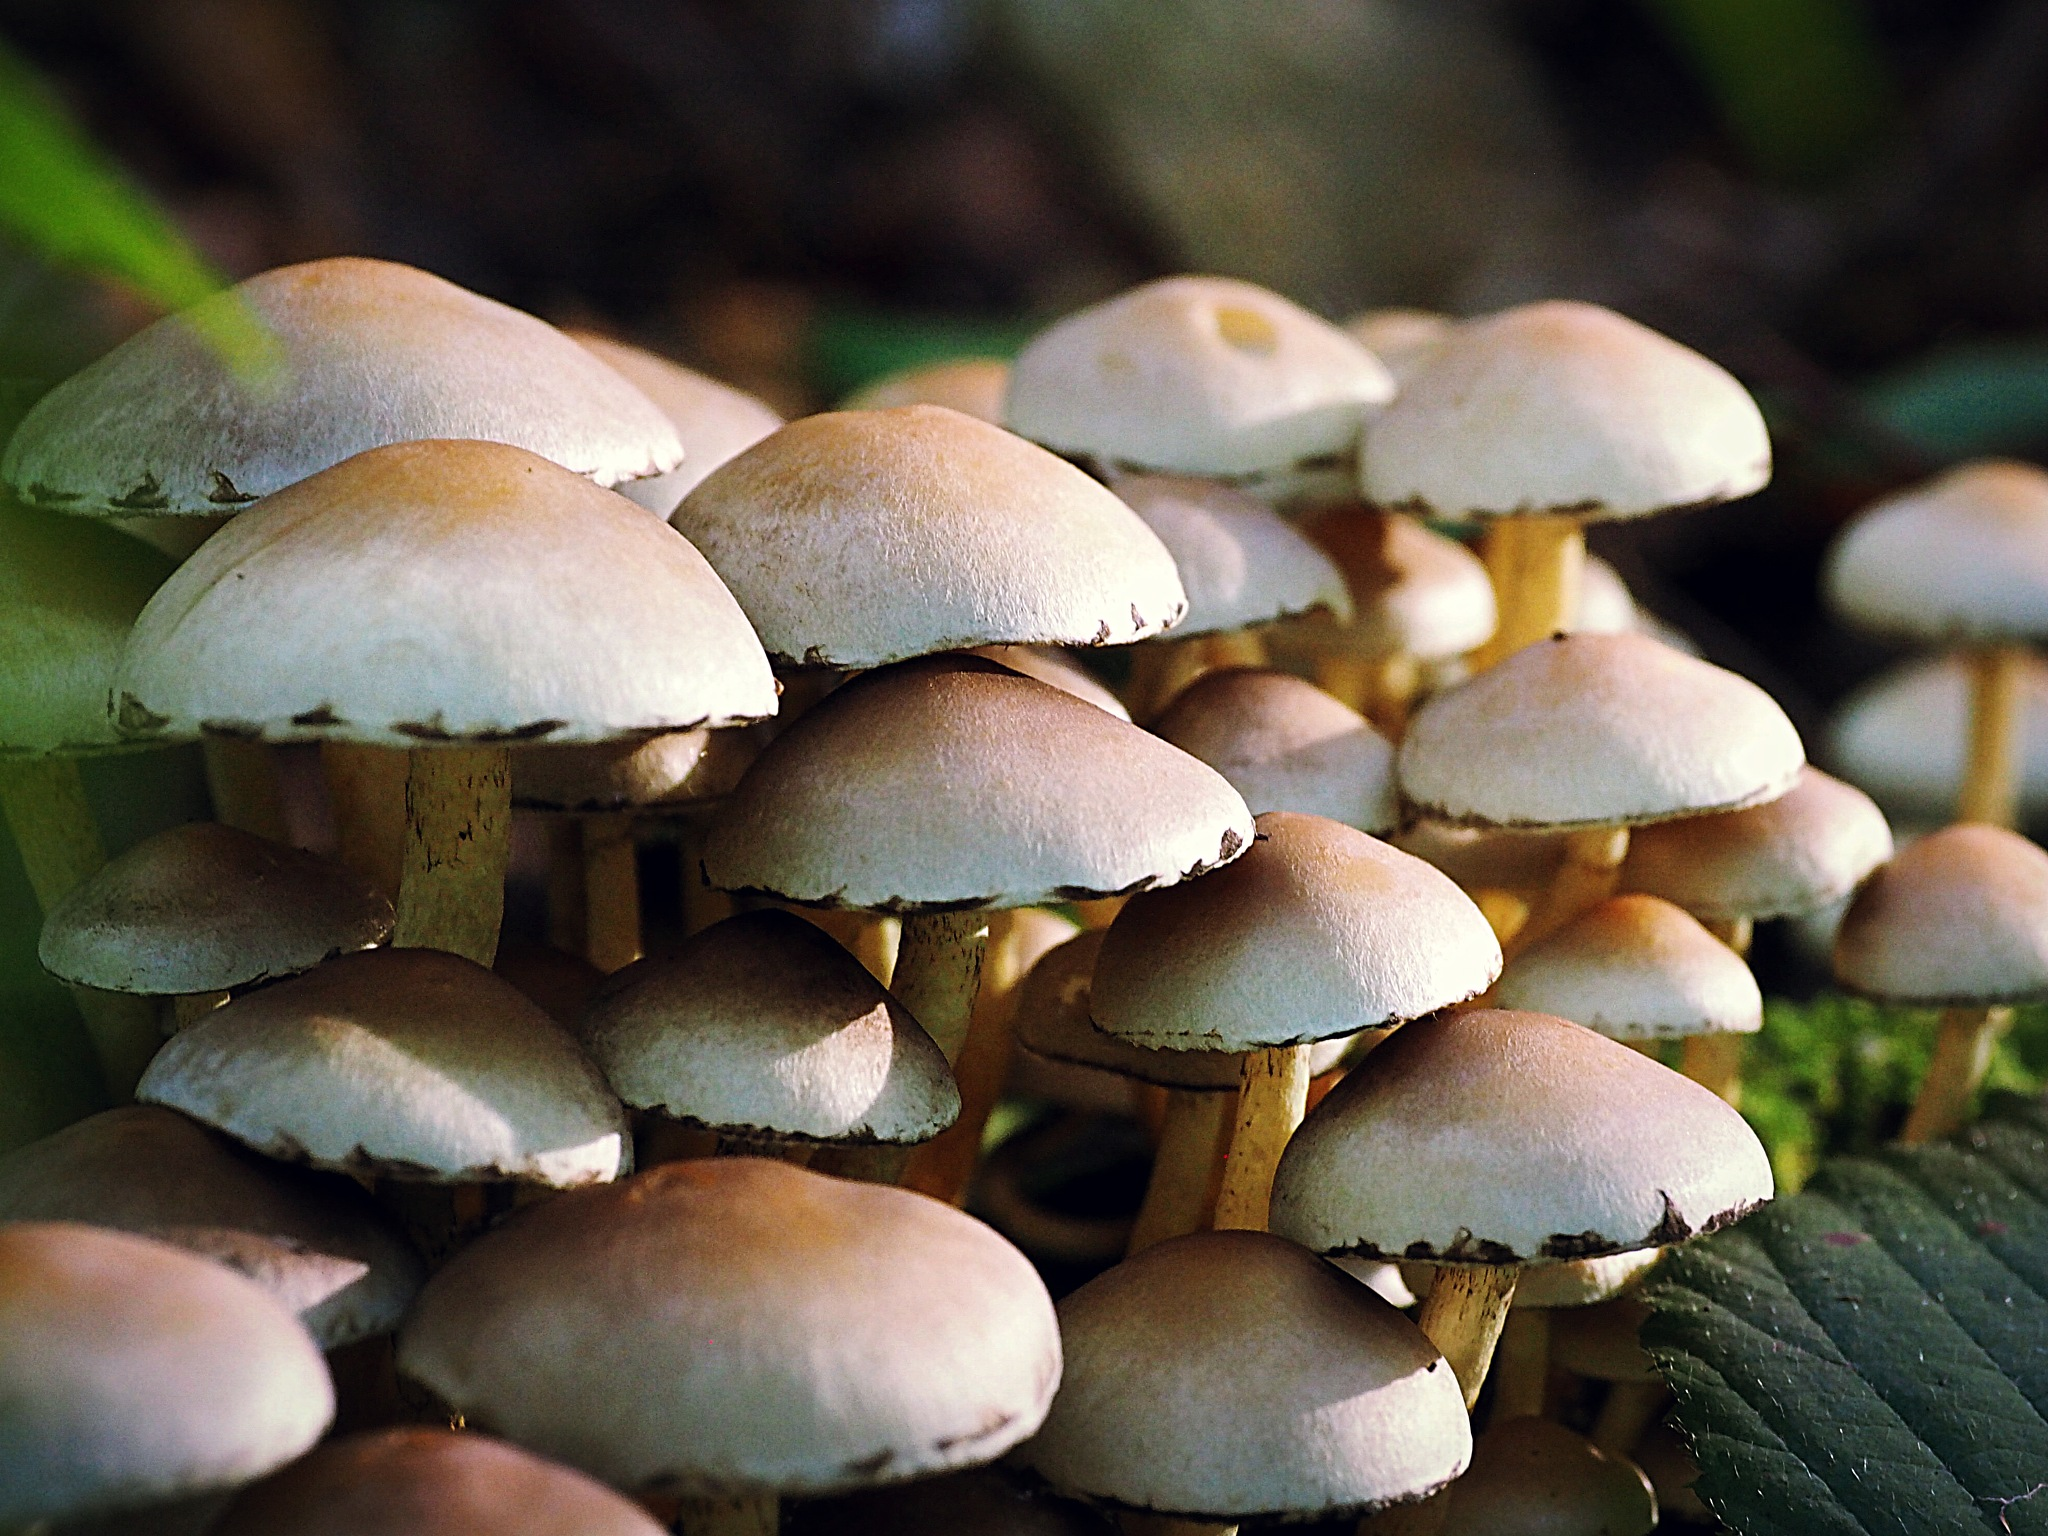 autumn mushrooms by alain michel